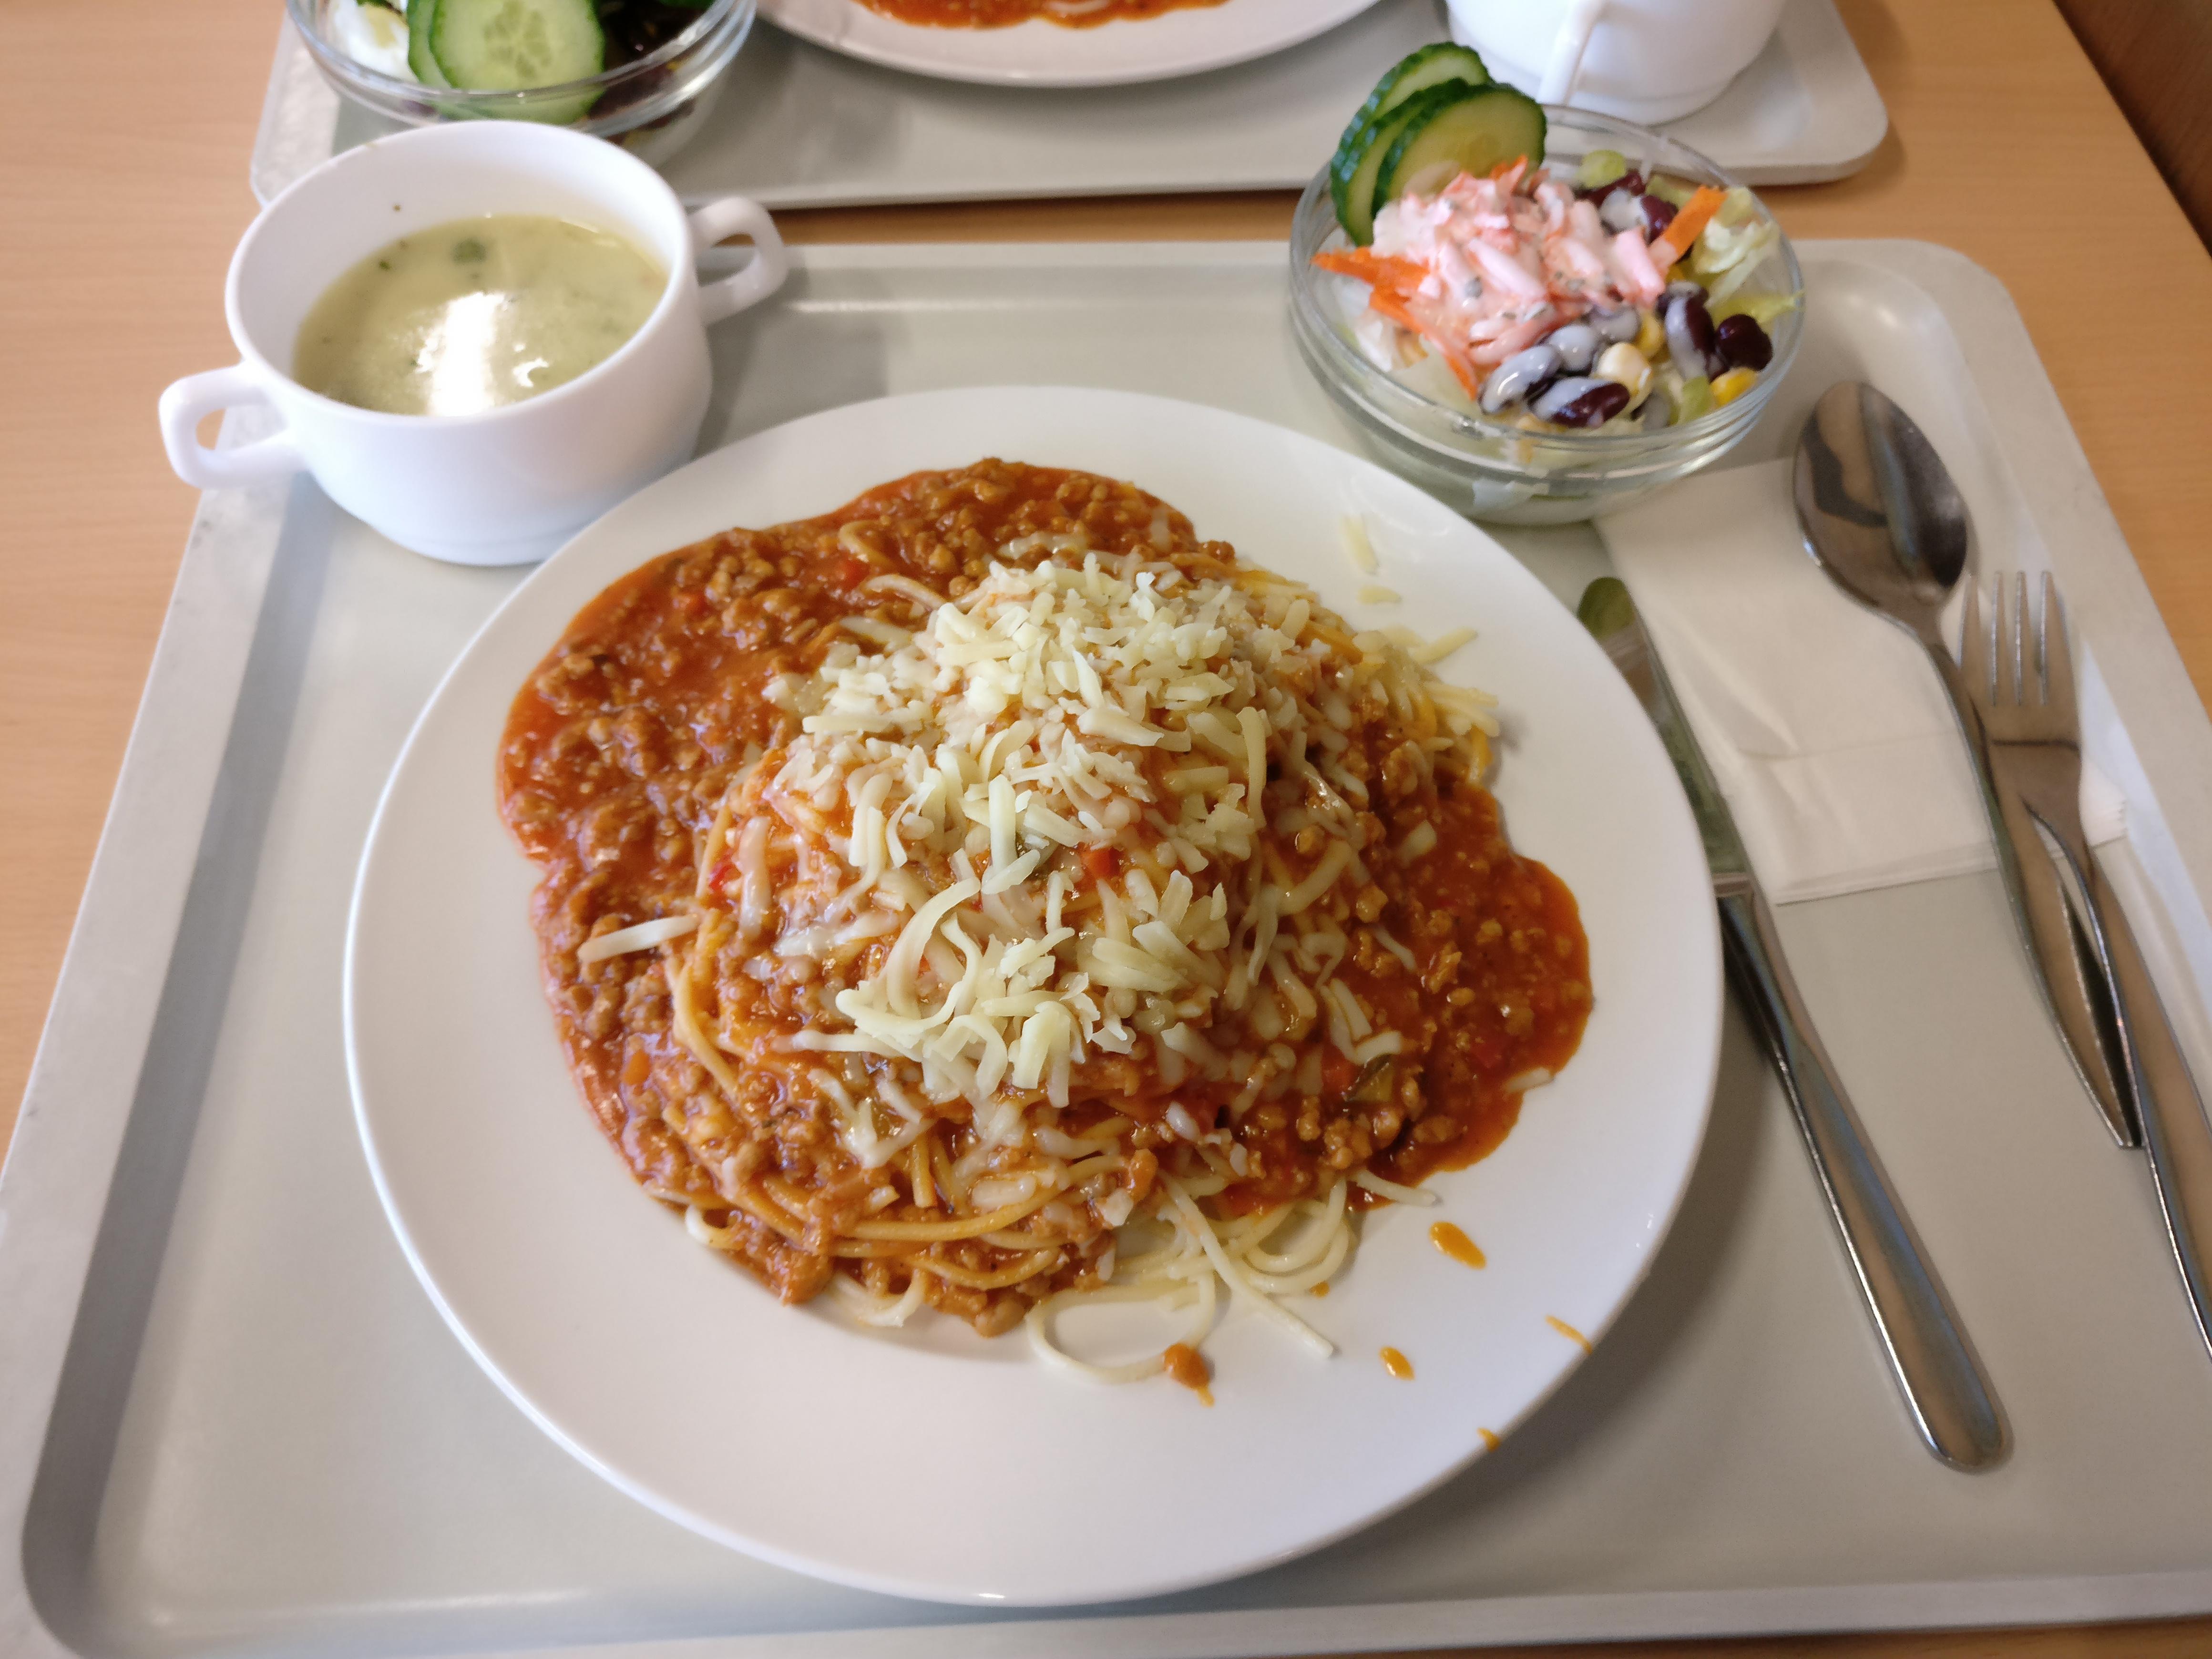 https://foodloader.net/nico_2016-12-19_spaghetti-bolognese-mit-suppe-und-salat.jpg